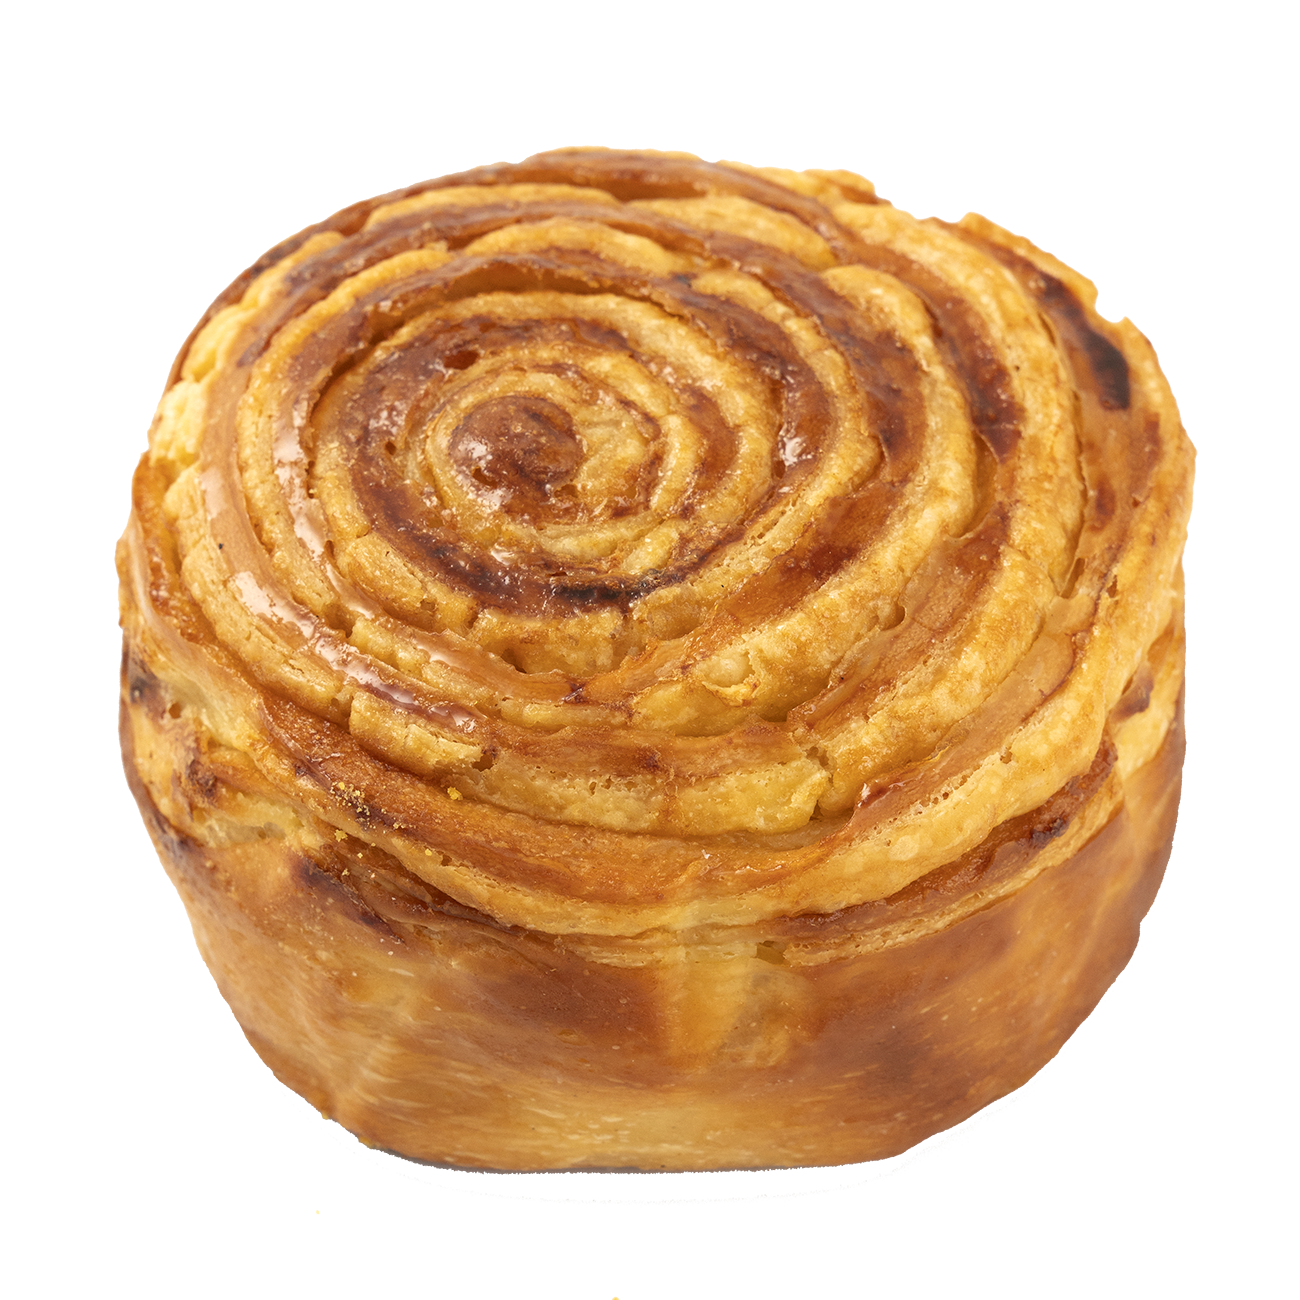 Island Croissant Roll